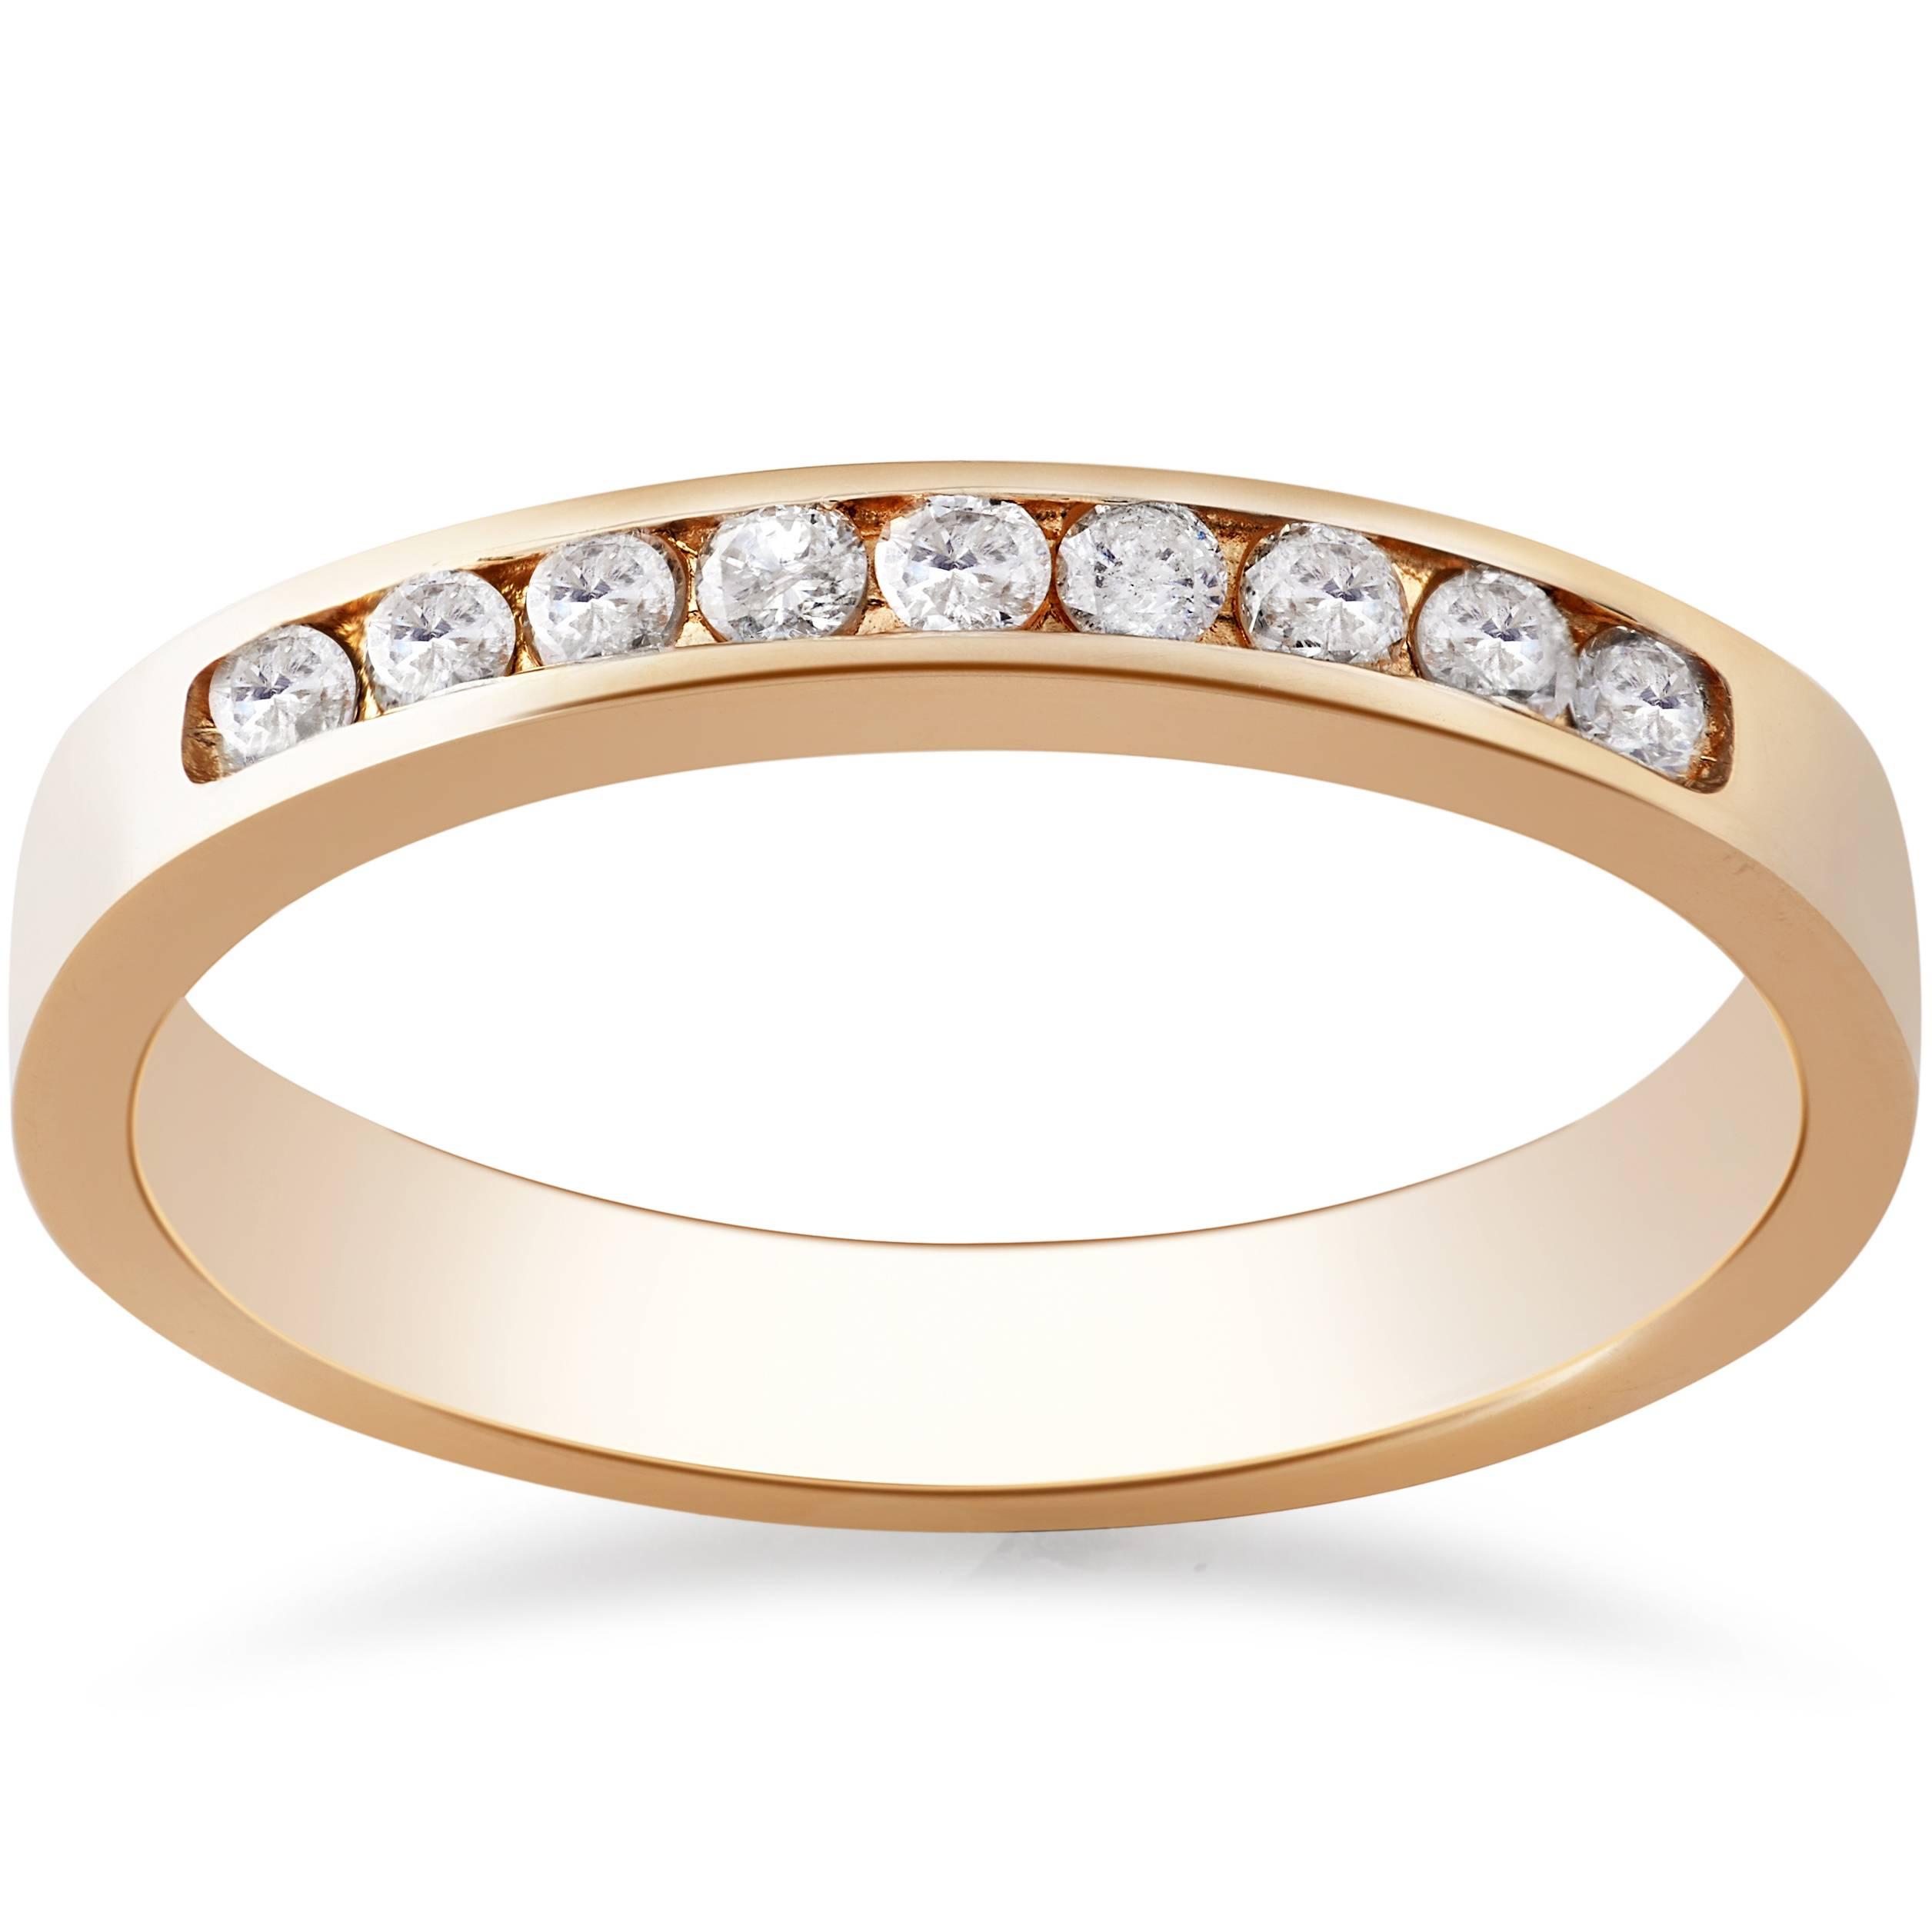 G SI 1 4ct Channel Set Lab Created Diamond Wedding Ring 14K Rose Gold